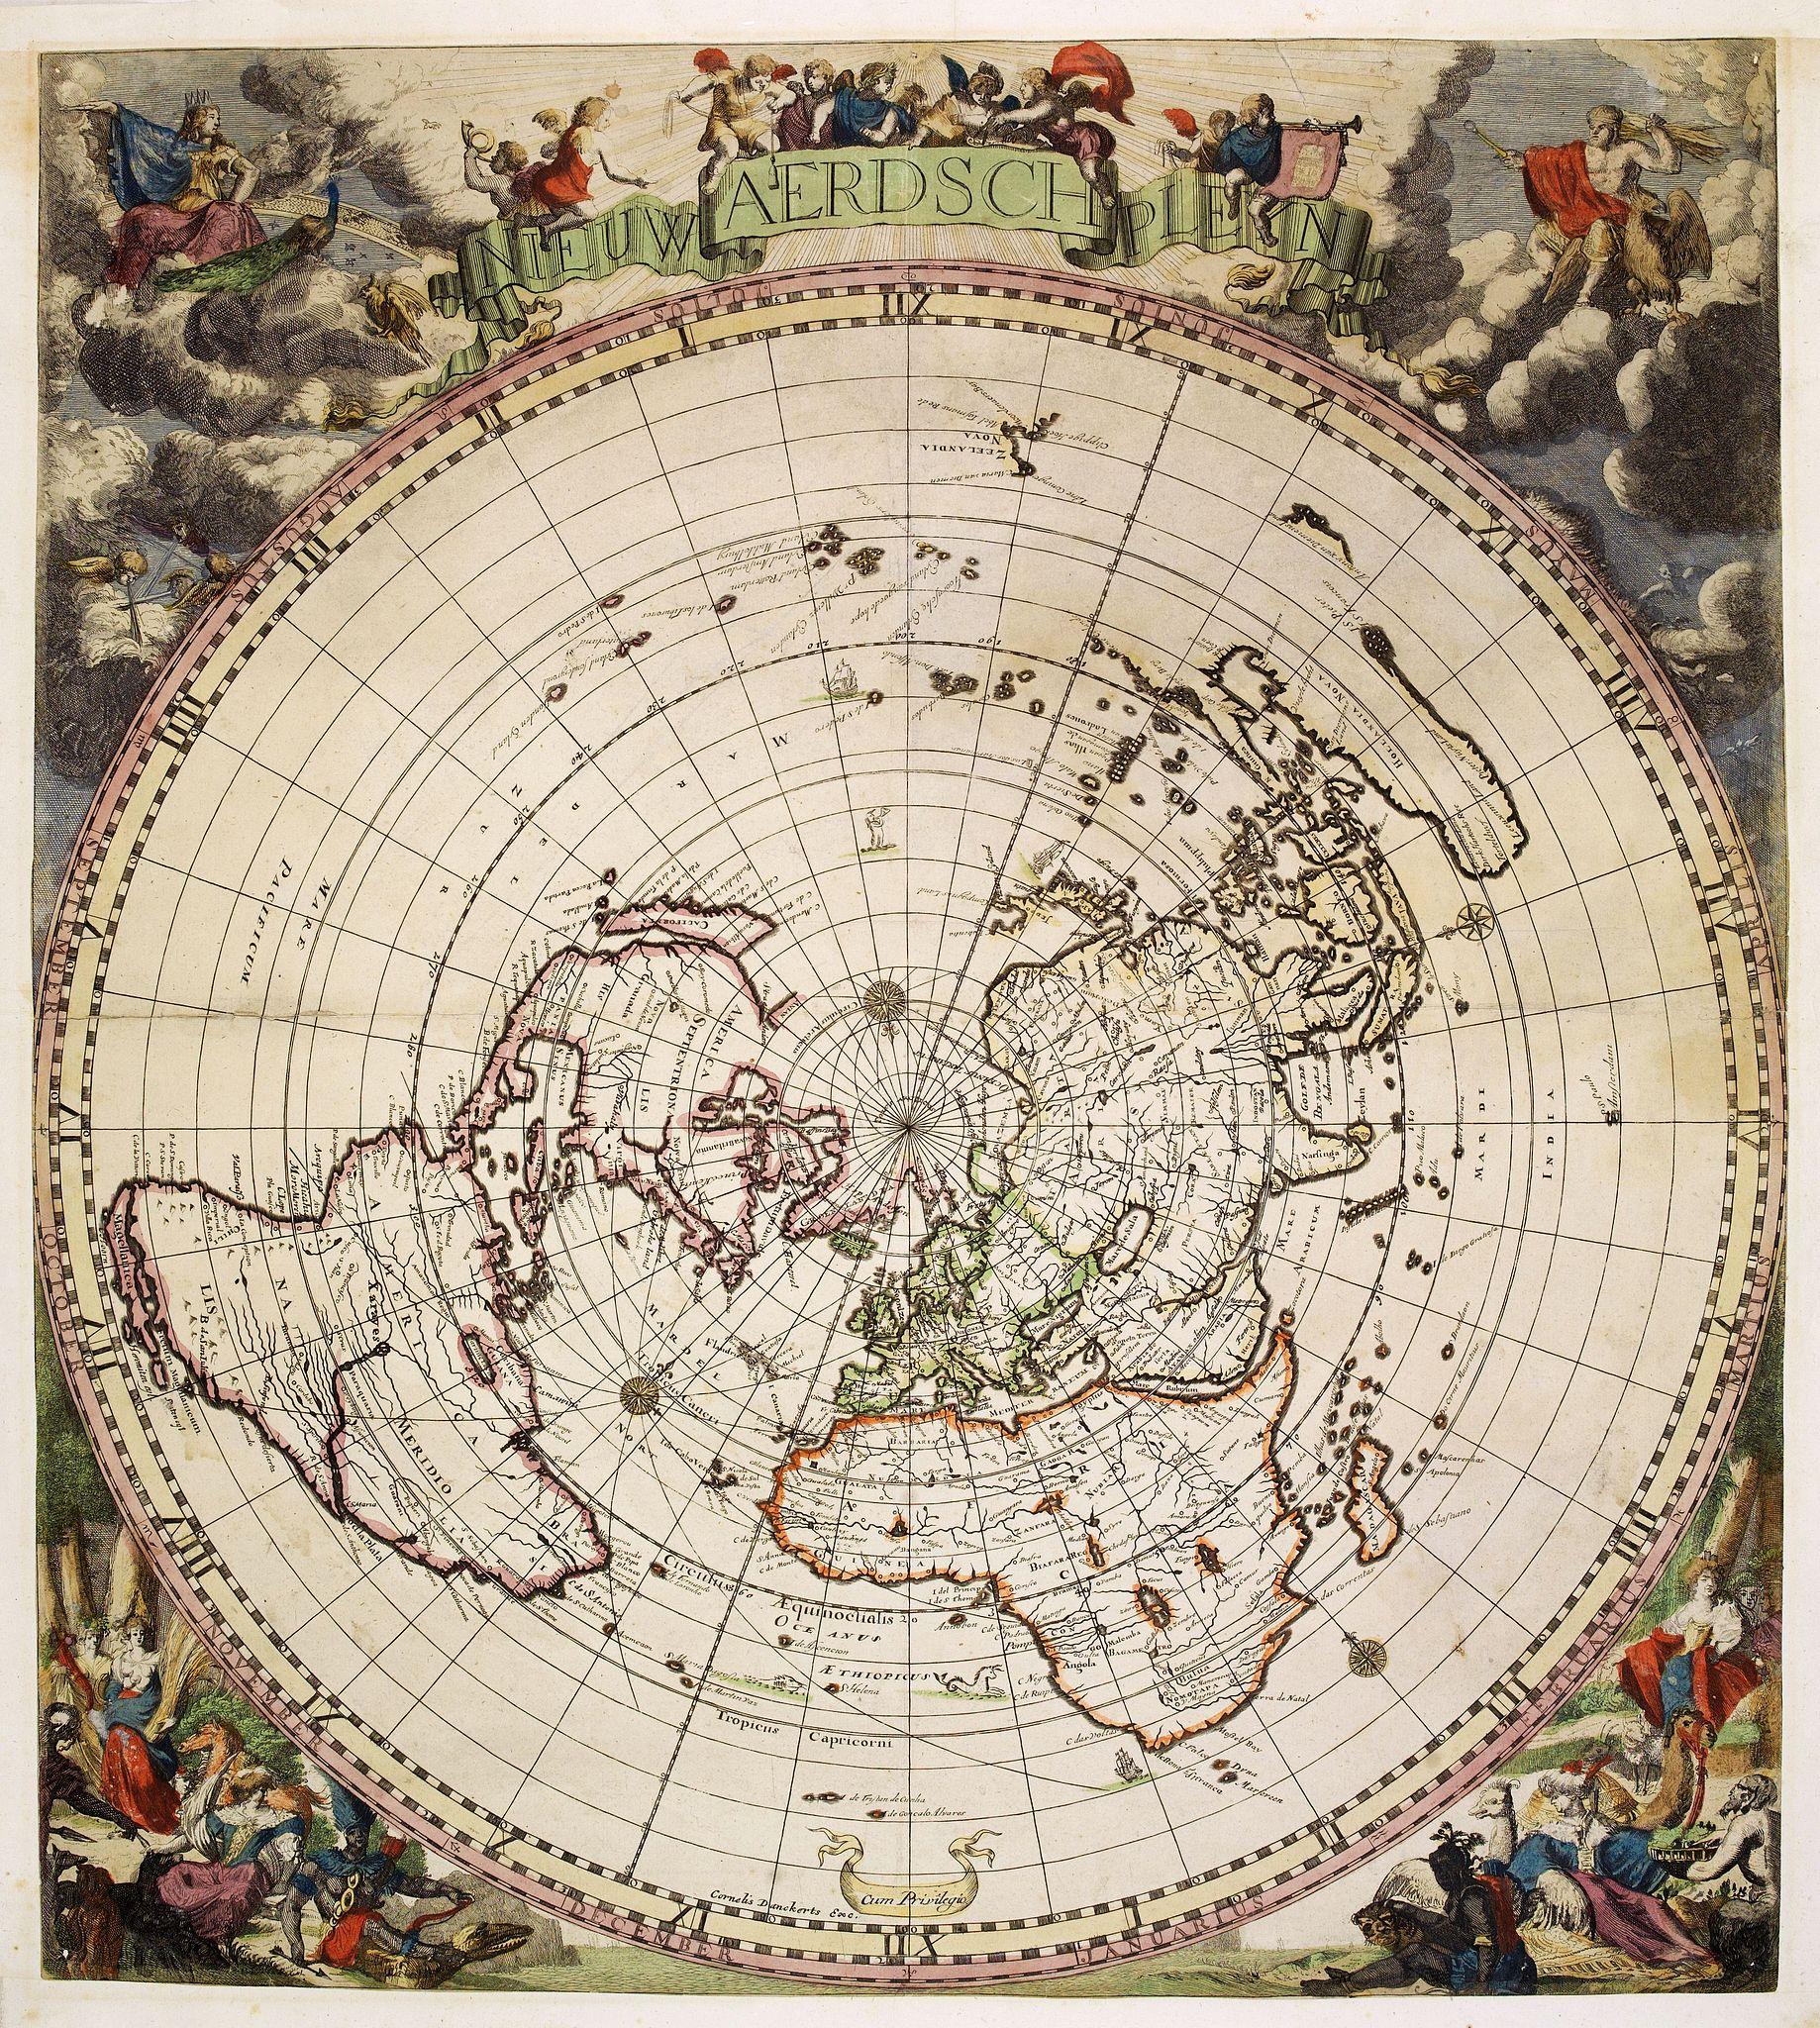 Old Map By Robijn Nieuw Aerdsch Pleyn